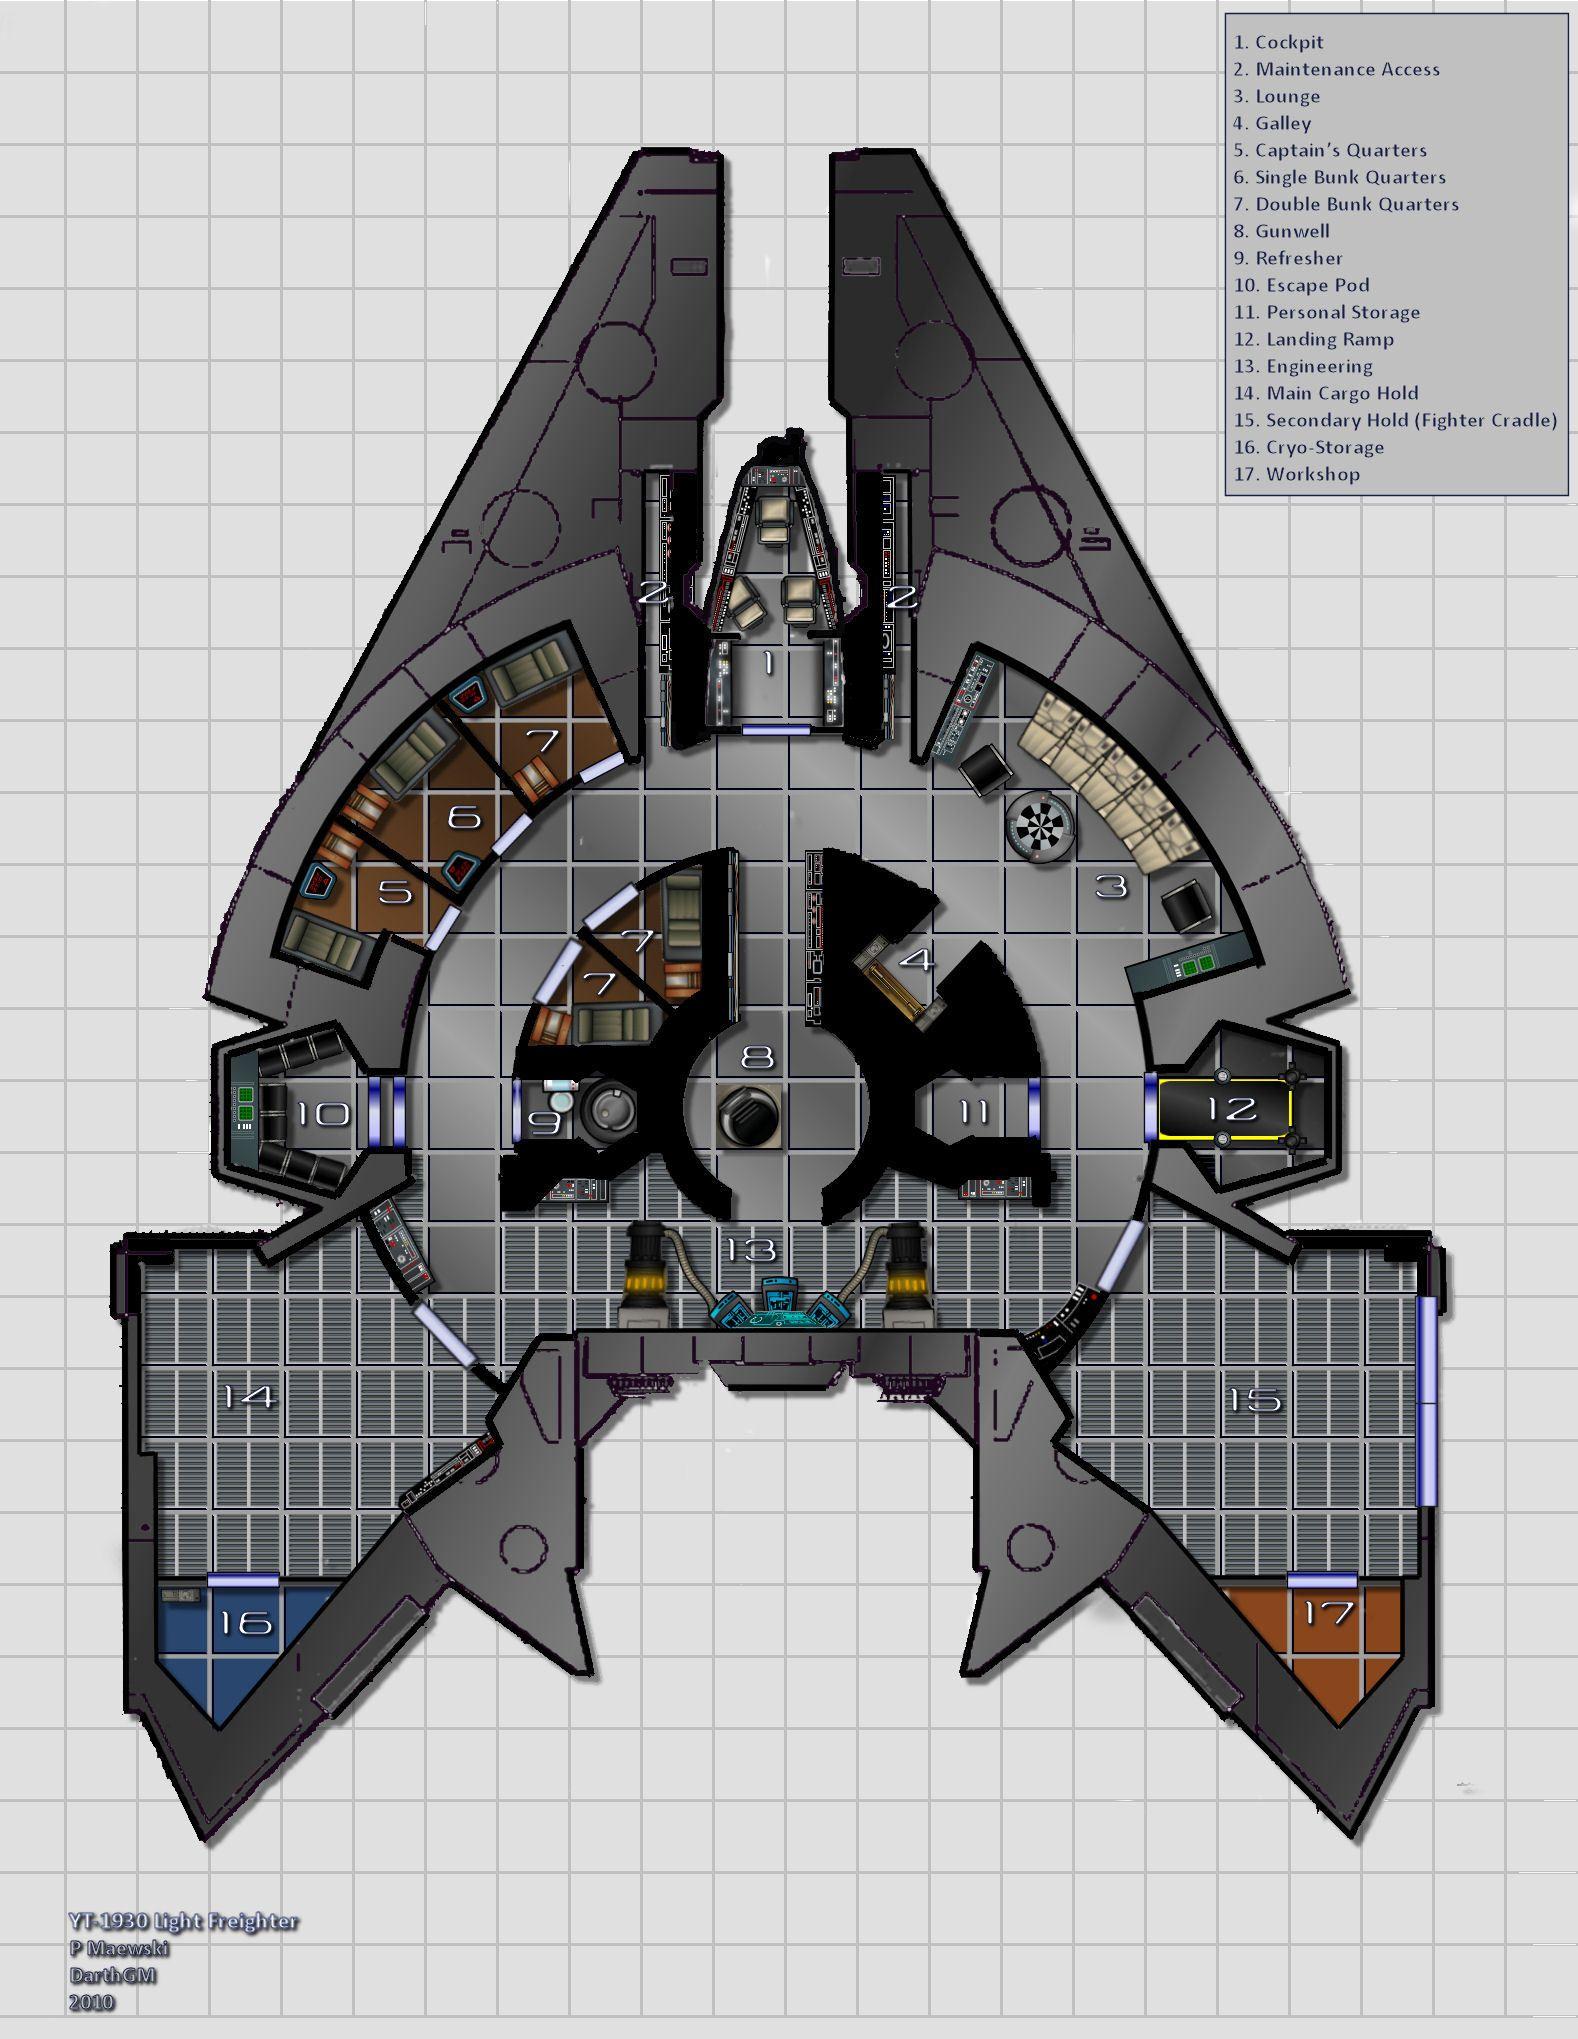 Star Wars Ship Floor Plans Part - 35: Post Your Favorite Star Wars Ship Designs. Description From Pinterest.com.  I Searched